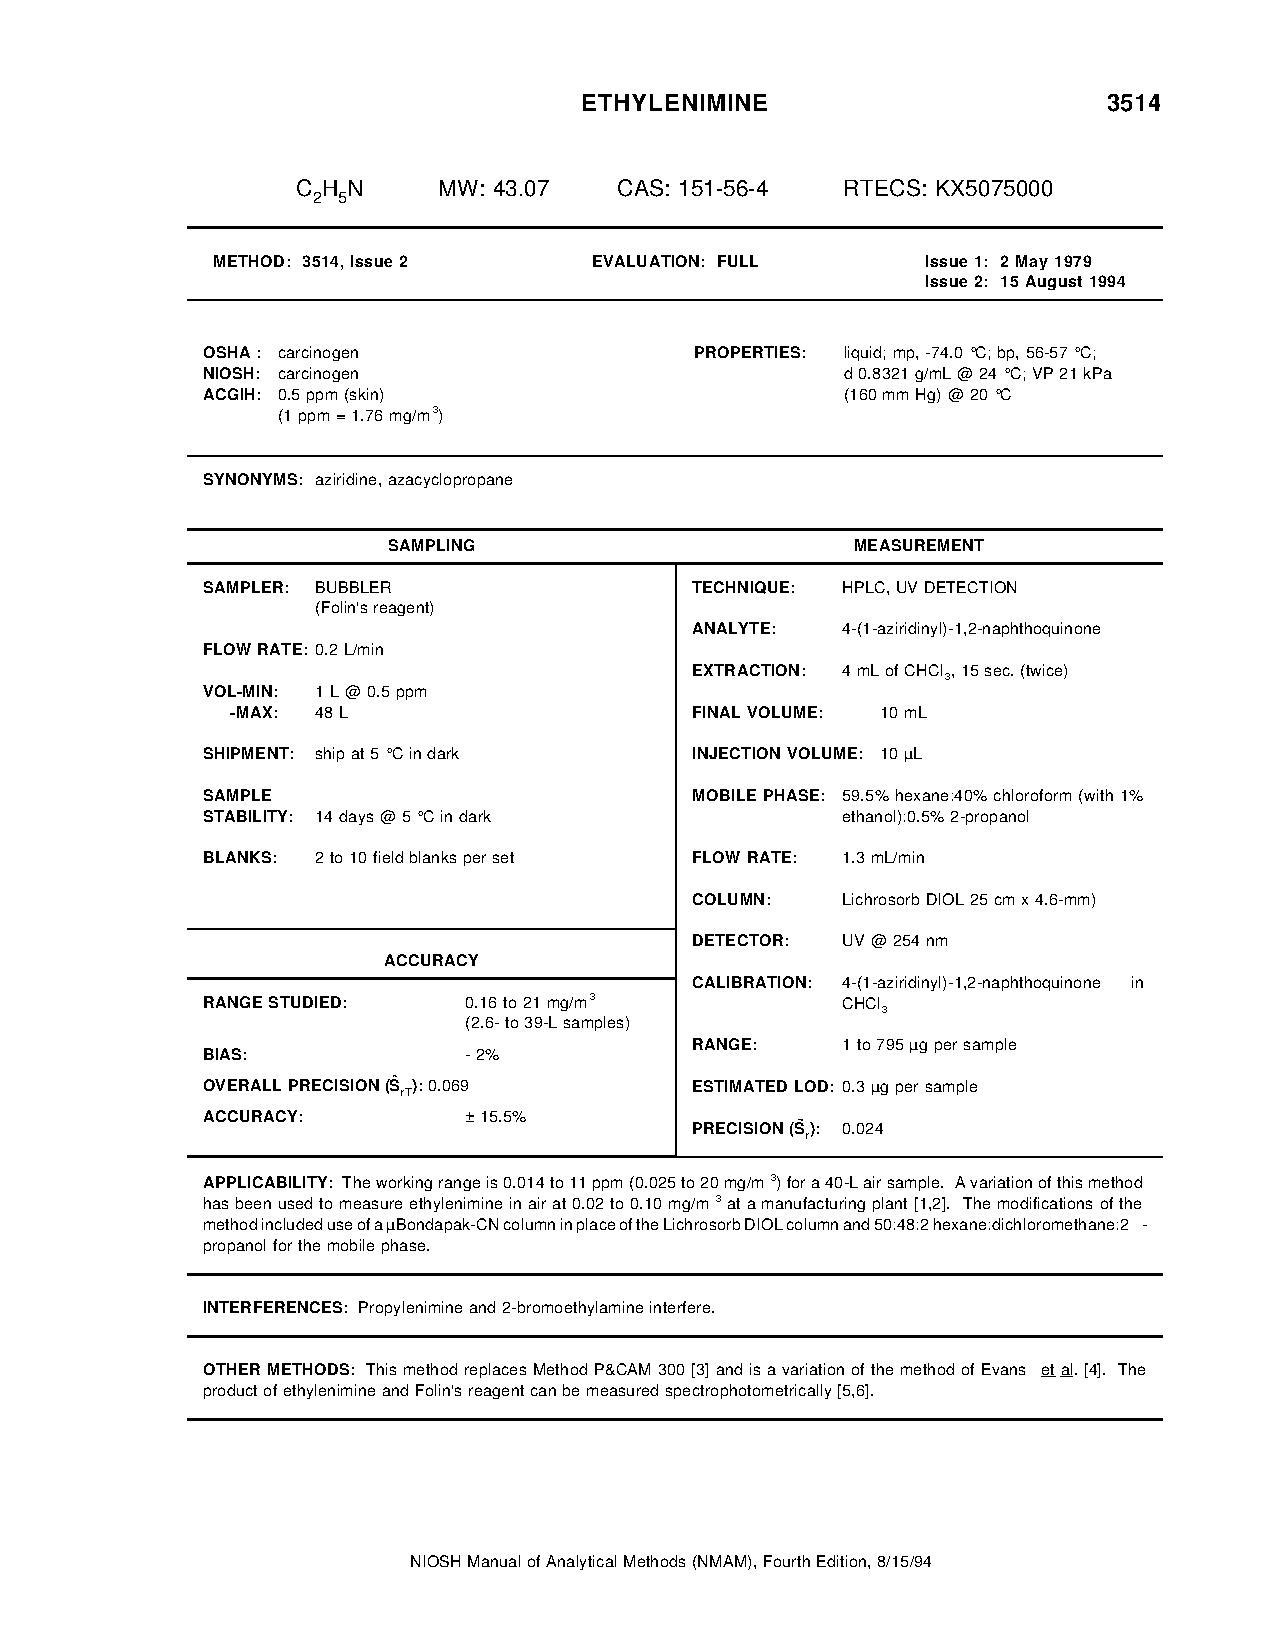 niosh manual of analytical methods 5th edition pdf